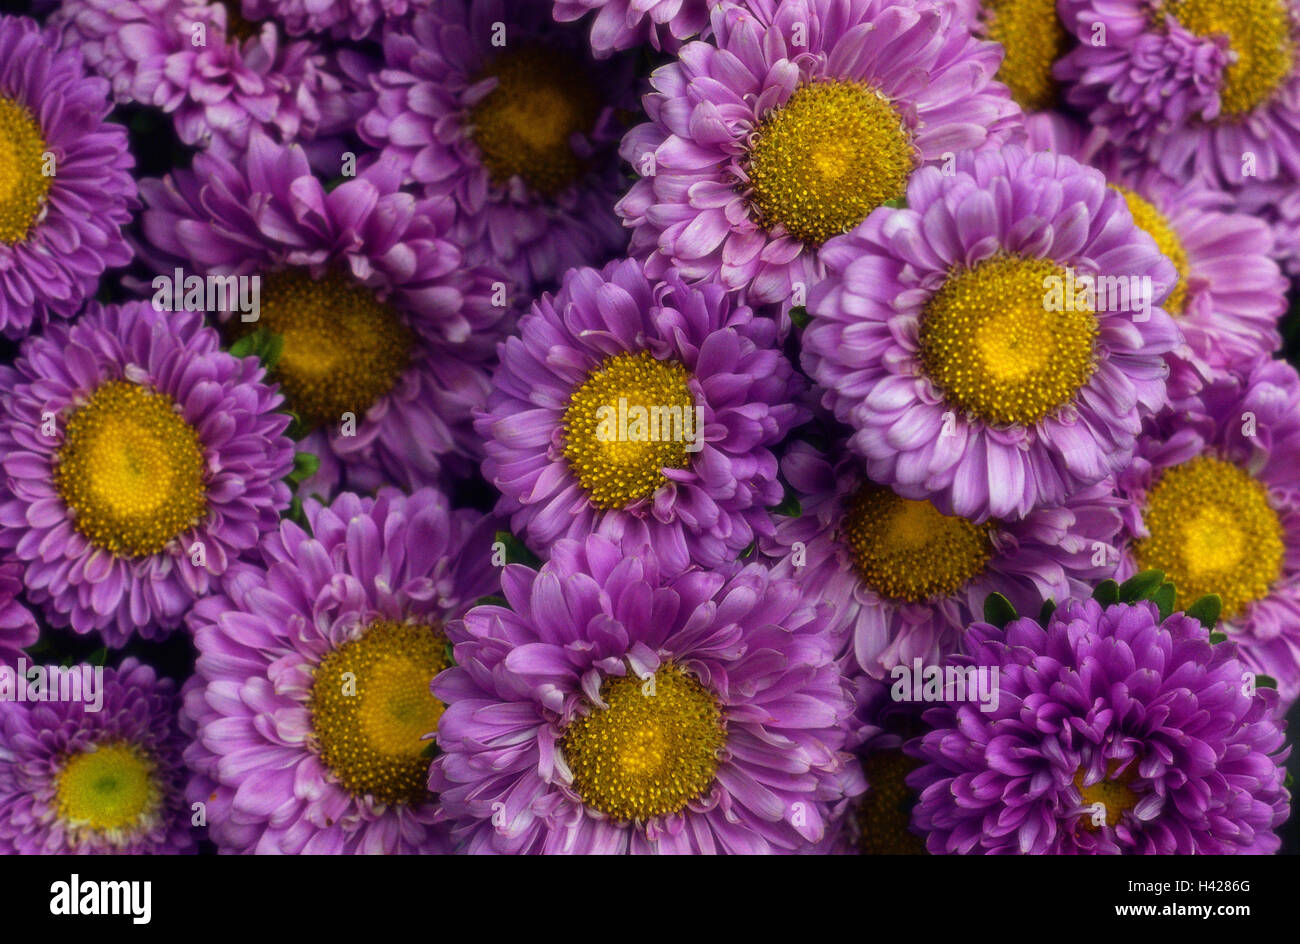 Fiori da giardino aiuola · foto gratis su pixabay